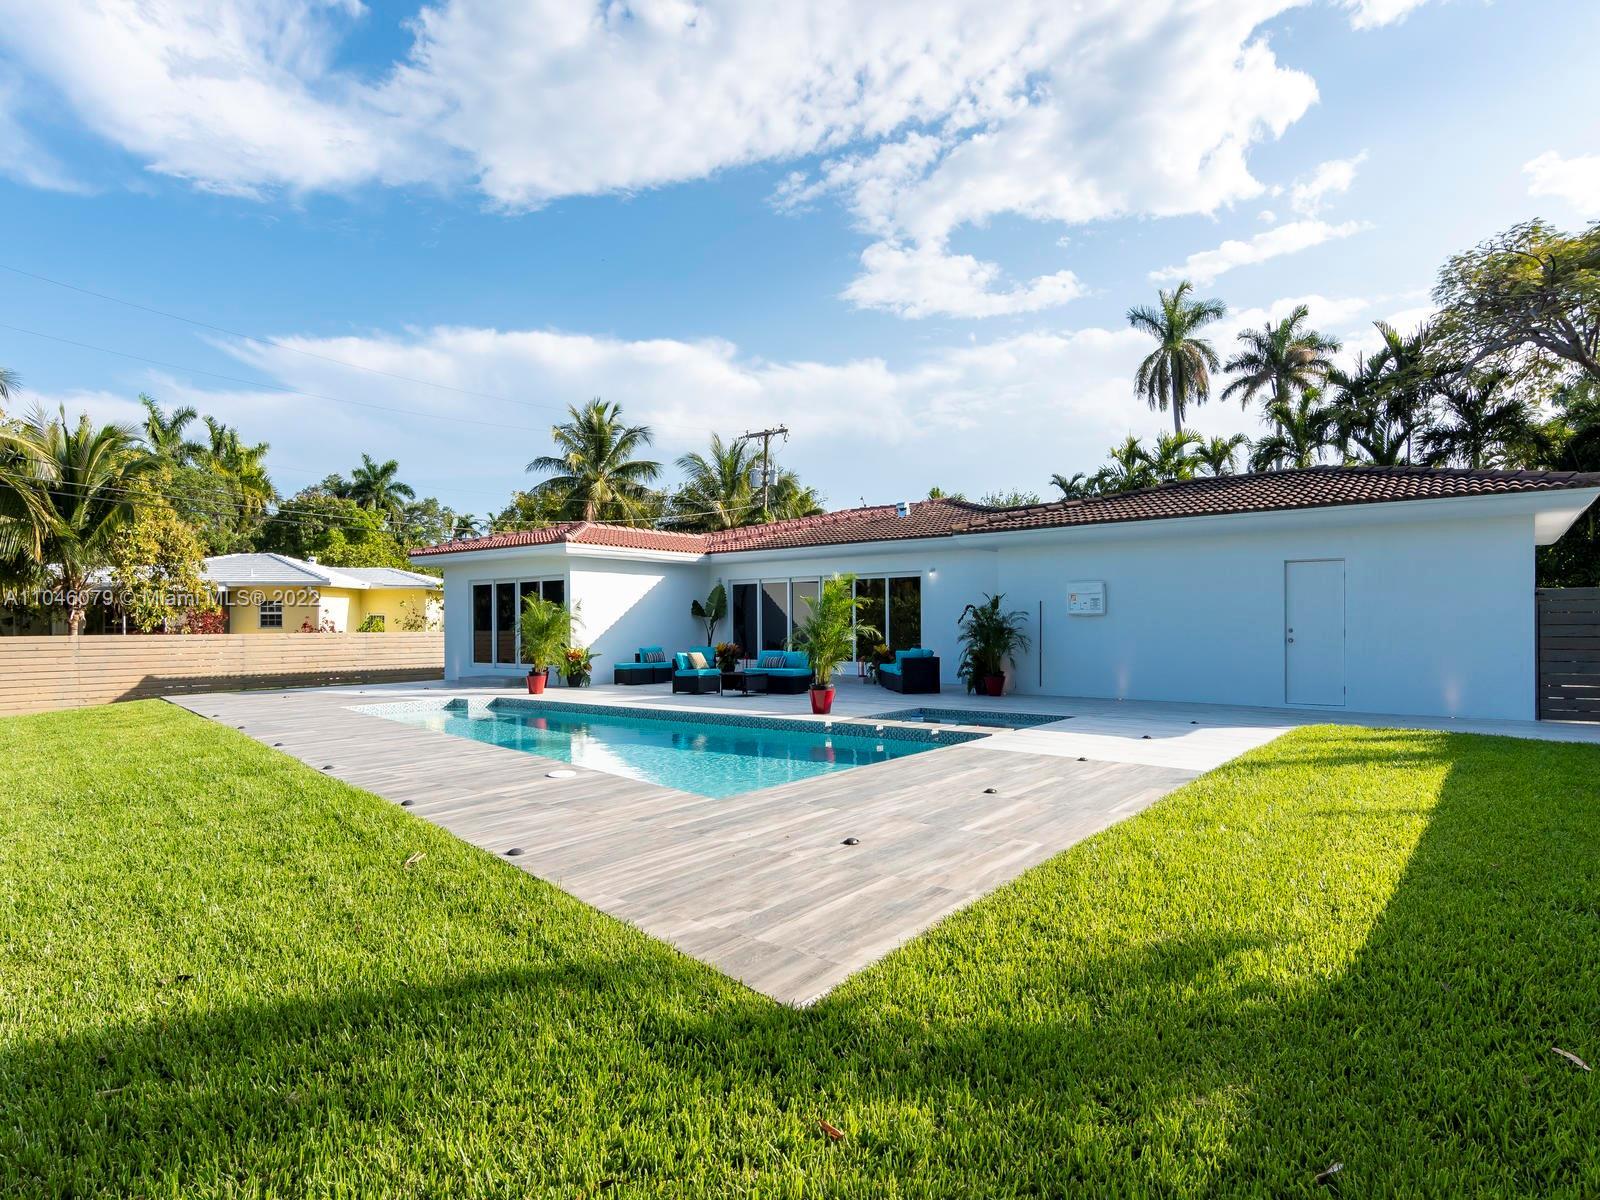 Miami Shores - 10125 Biscayne Blvd, Miami Shores, FL 33138